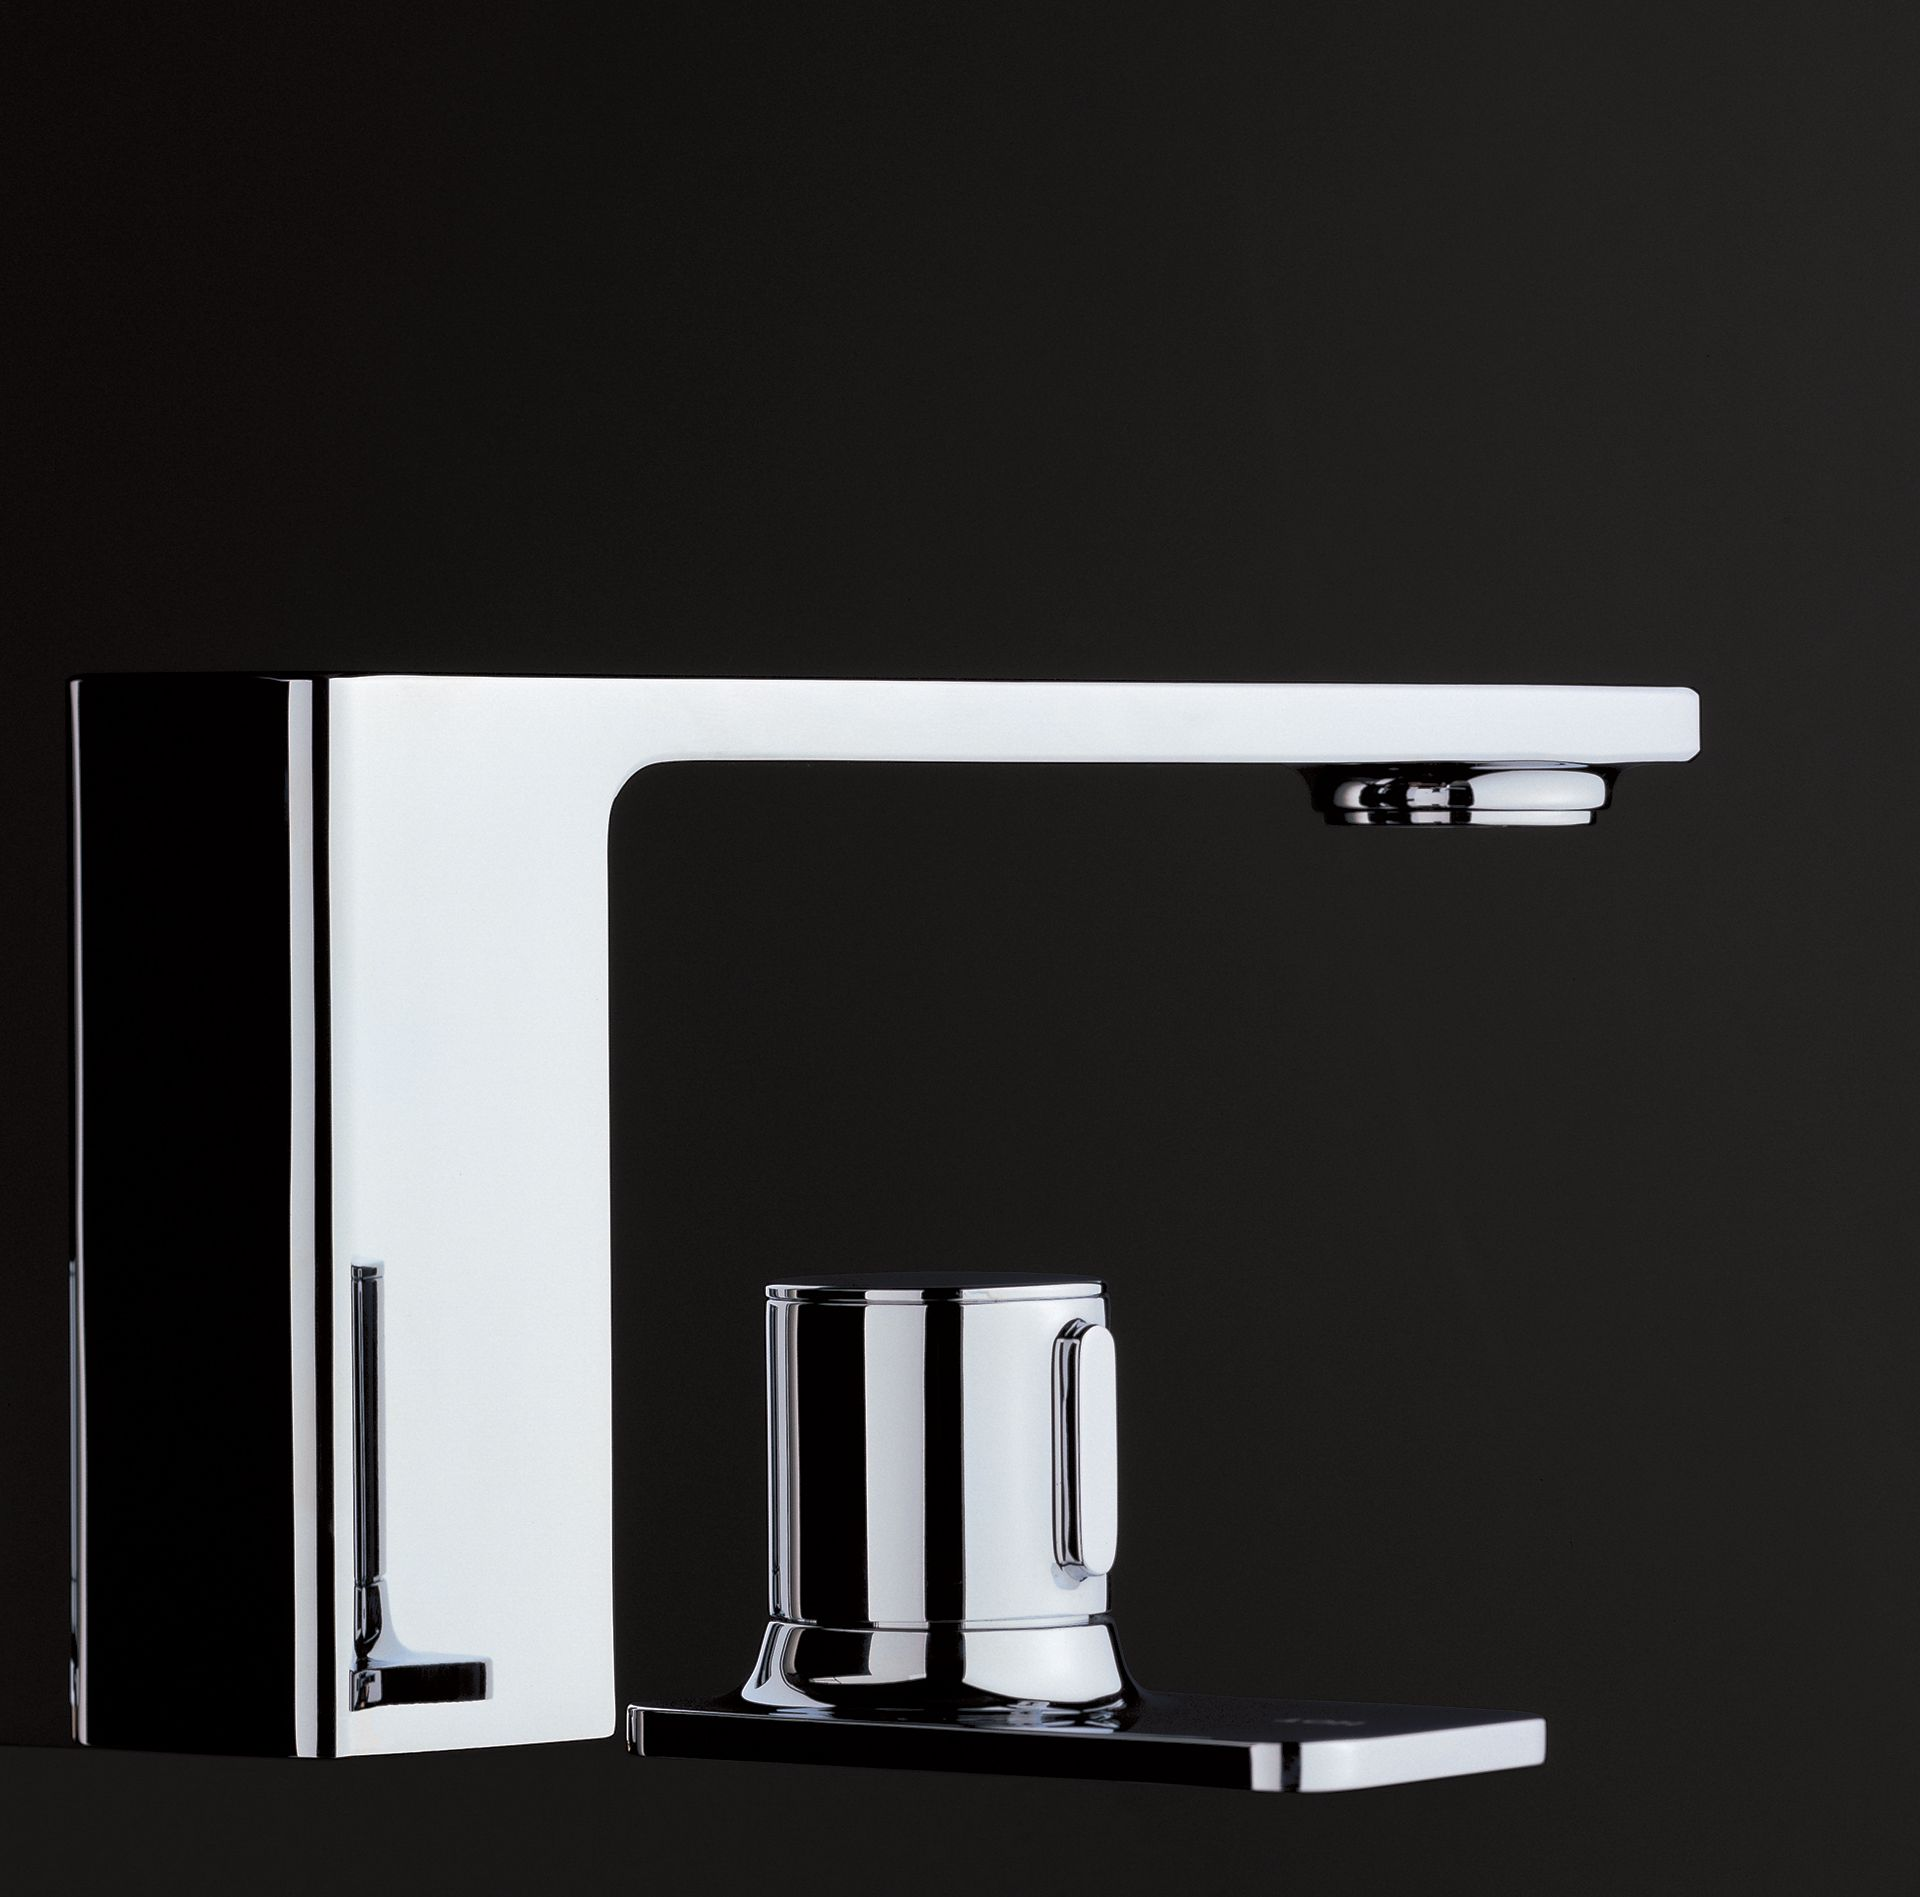 Kiwami® Renesse® Deck-Mount Faucet - TotoUSA.com